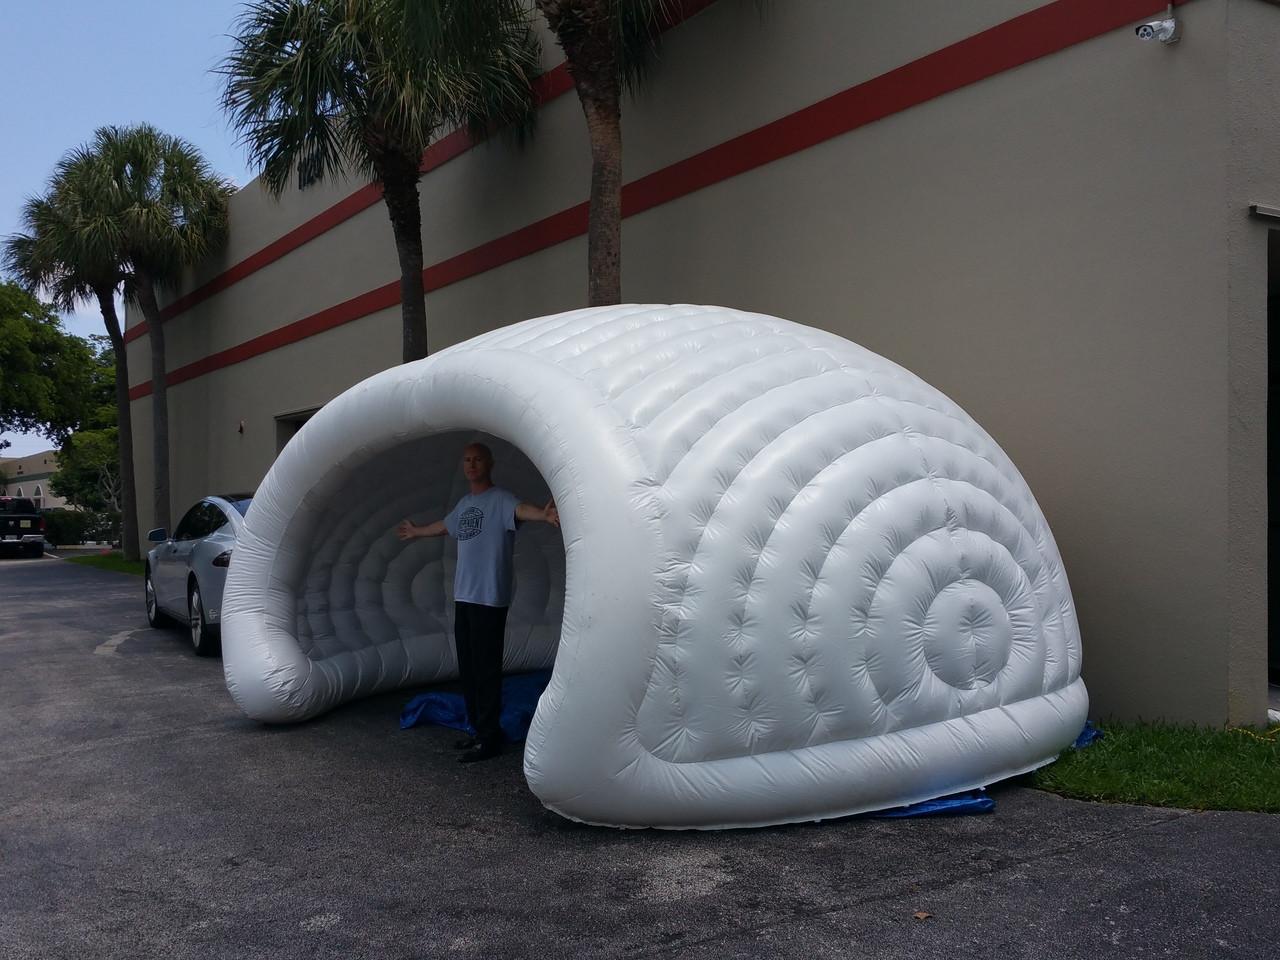 LED_DJ_BAR_VIP_BOOTH_Inflatable_Tent_Clam Shell_Cabana_VIP Cabana_VIP Booth